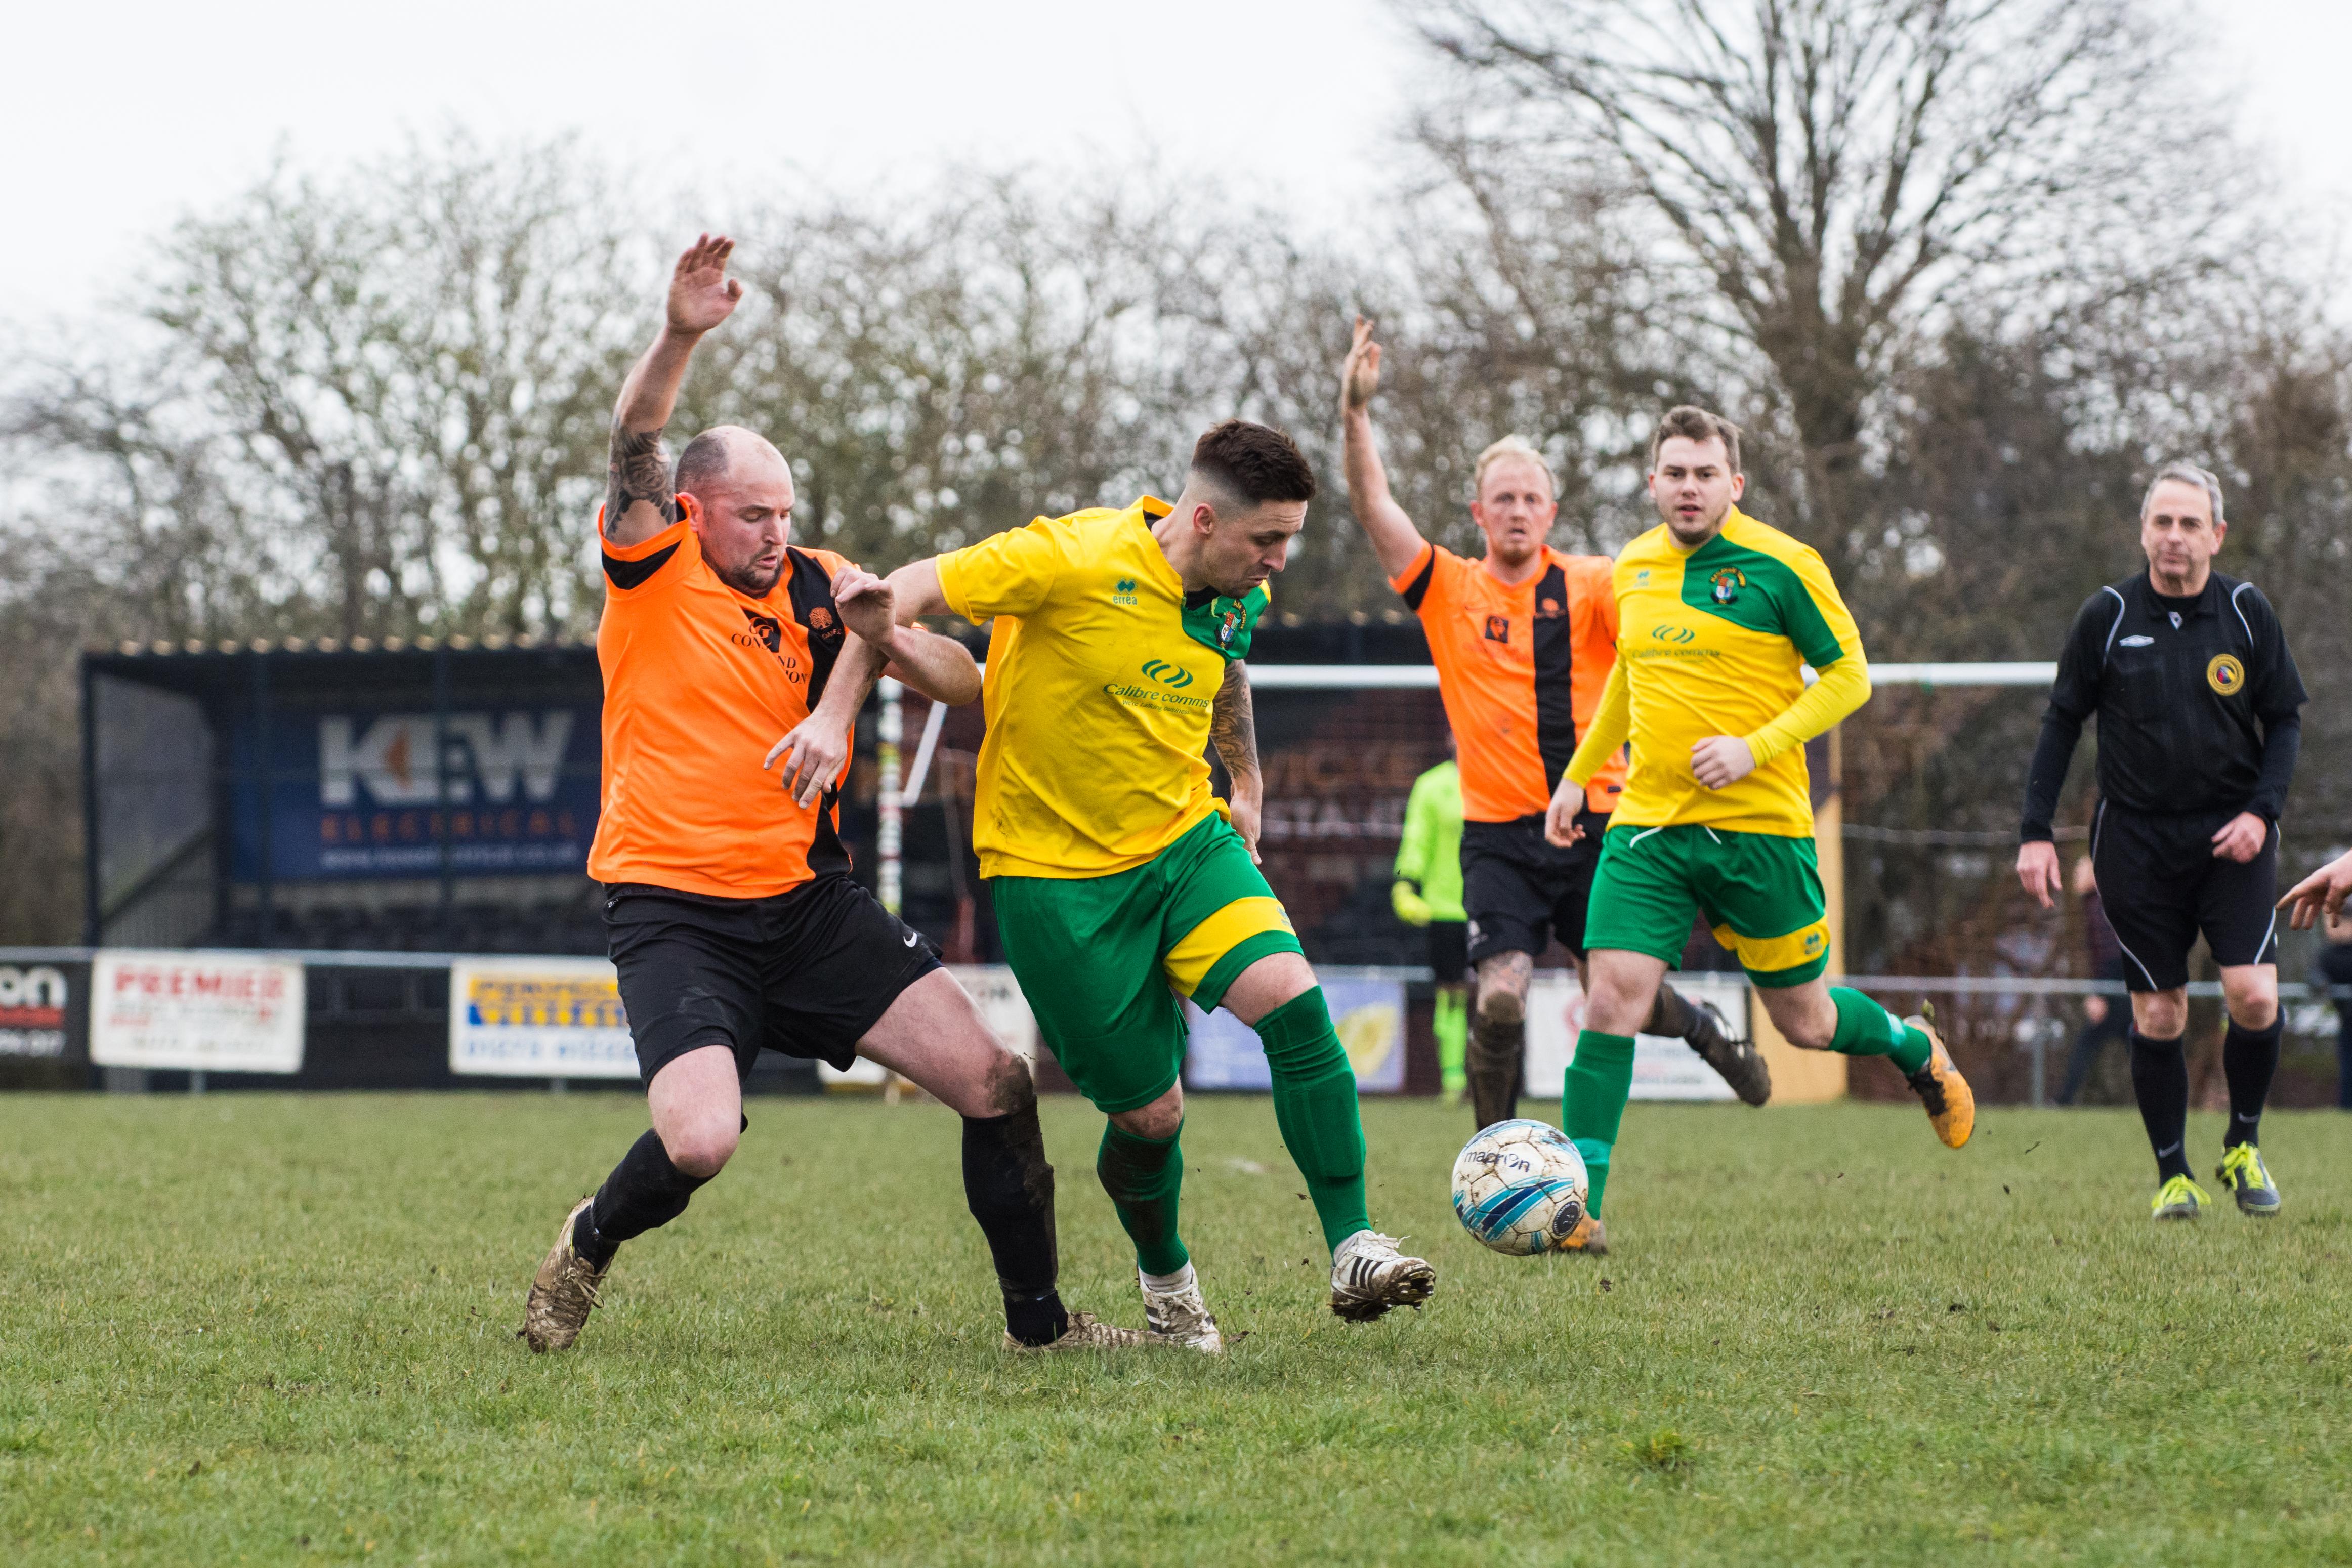 DAVID_JEFFERY Mile Oak FC vs Hailsham Town FC 24.03.18 81